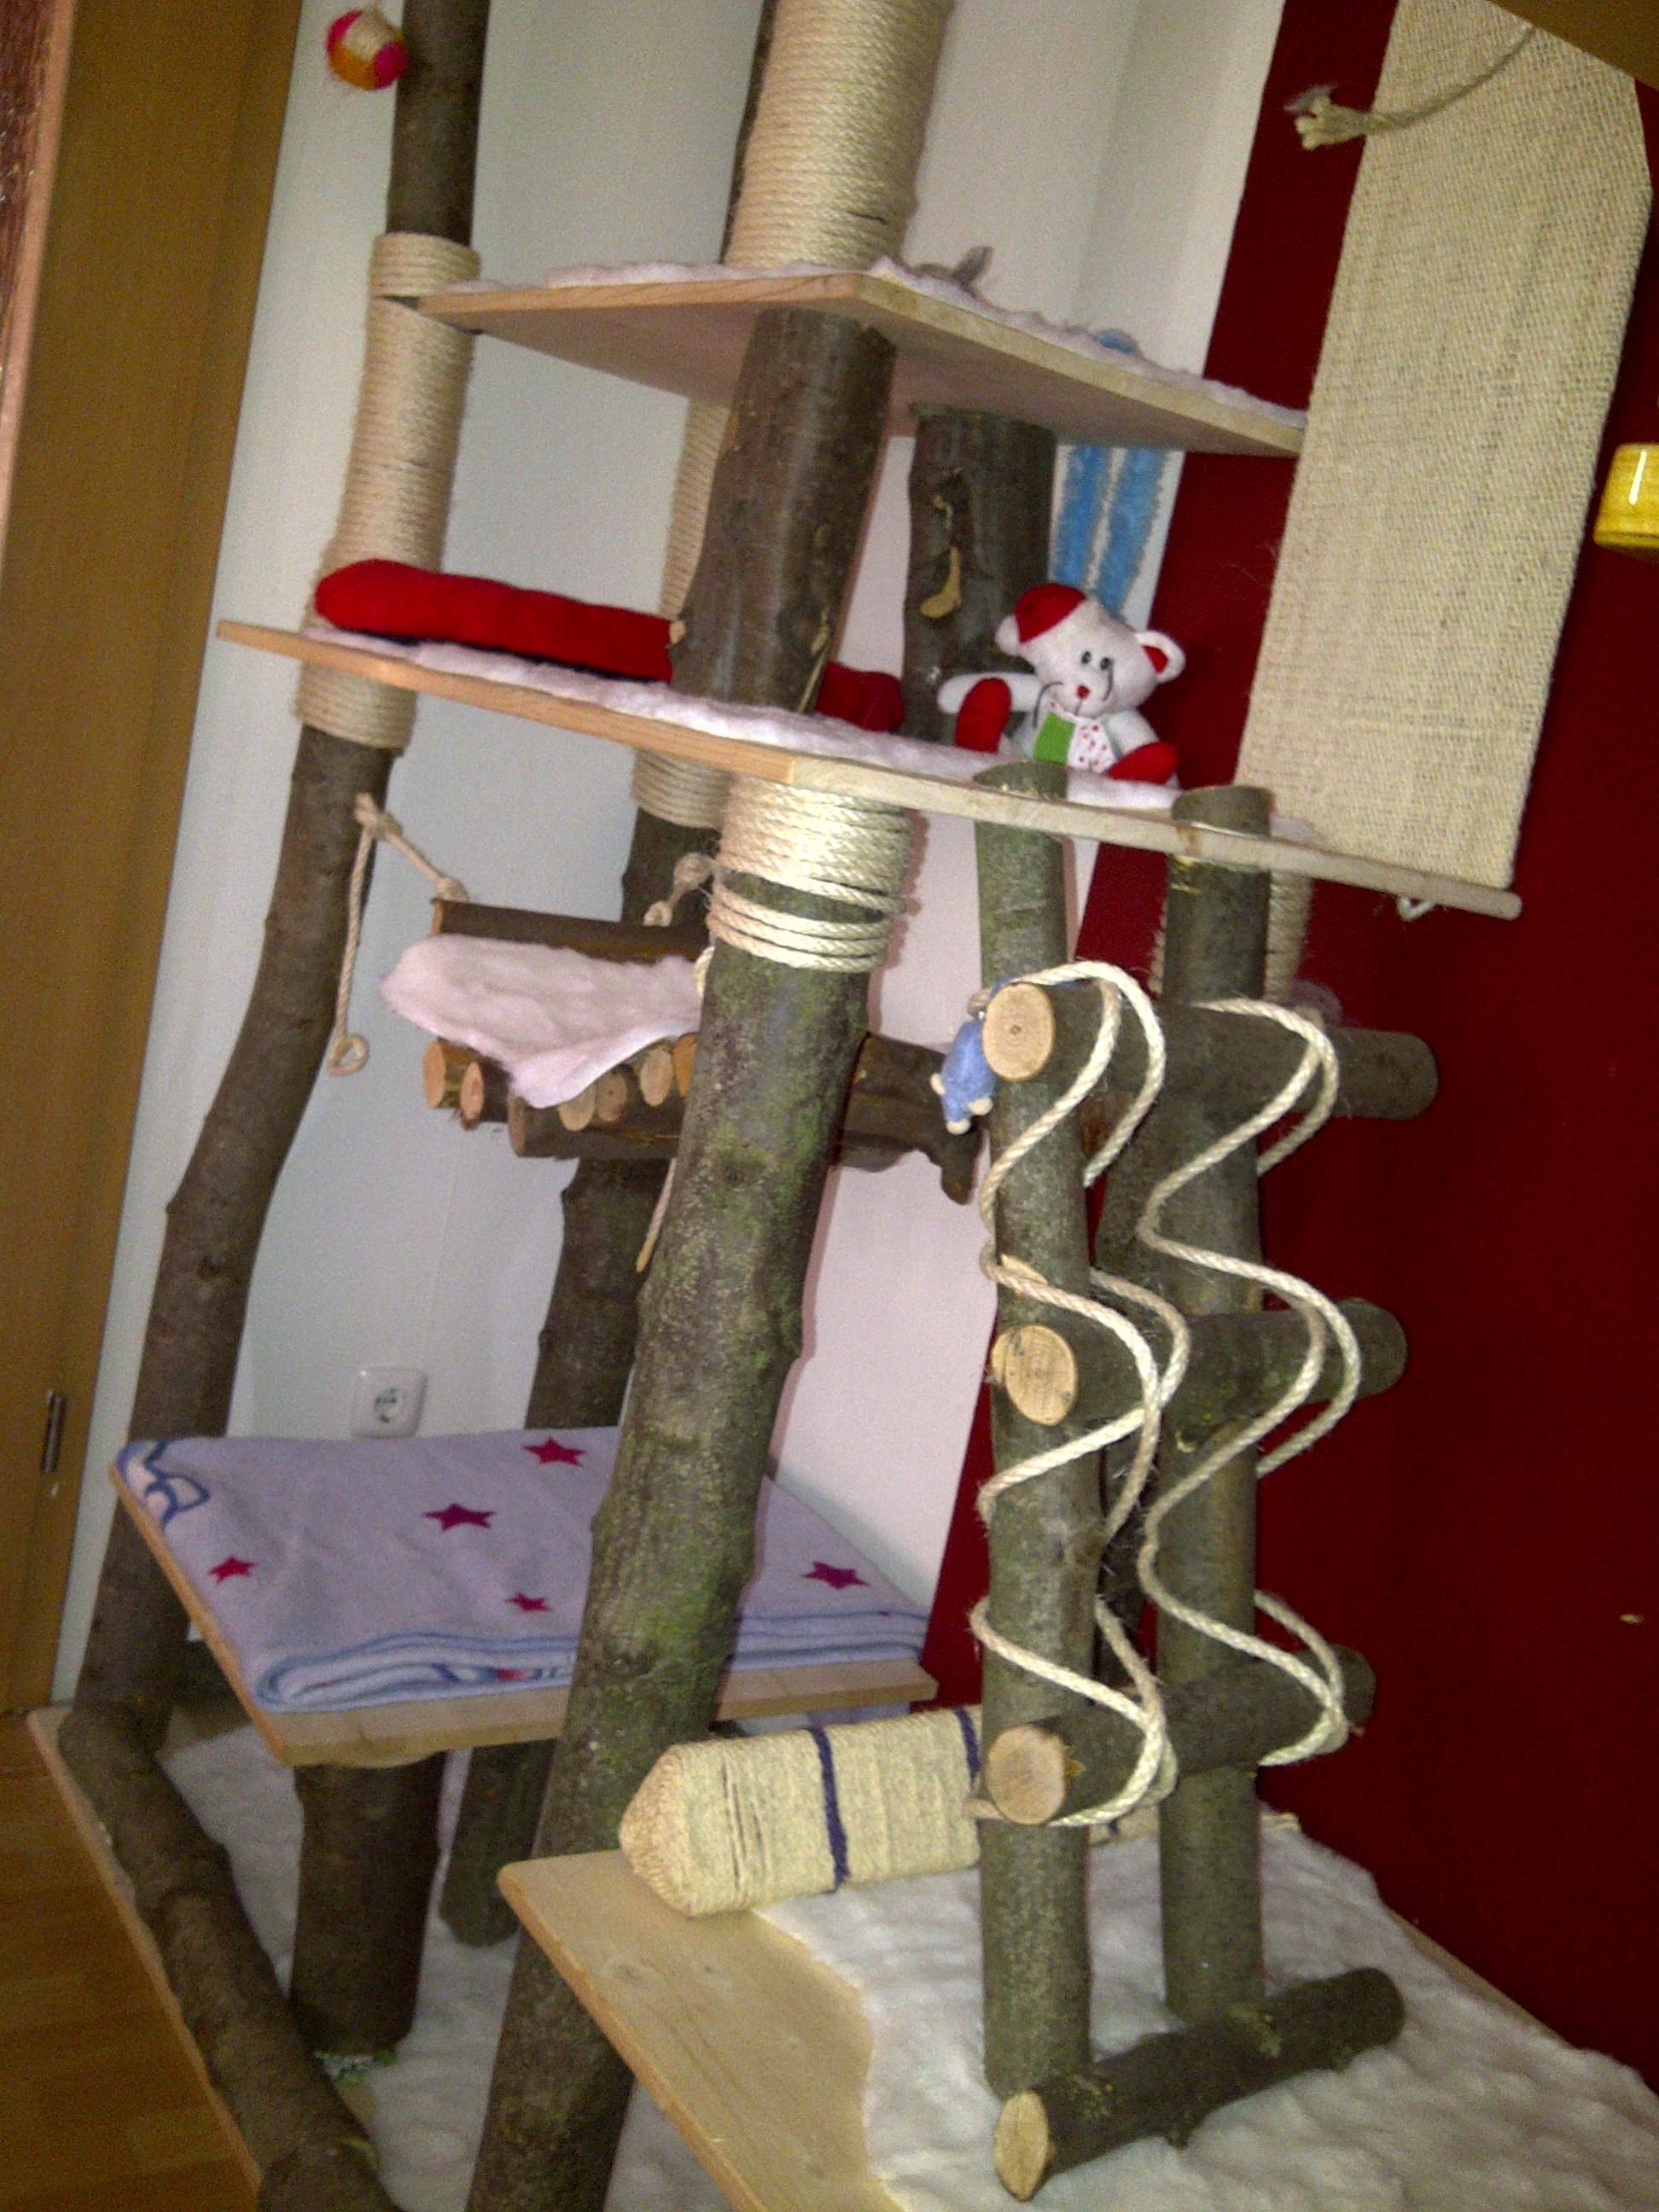 kratzbaum selber bauen do it yourself katzenforum. Black Bedroom Furniture Sets. Home Design Ideas